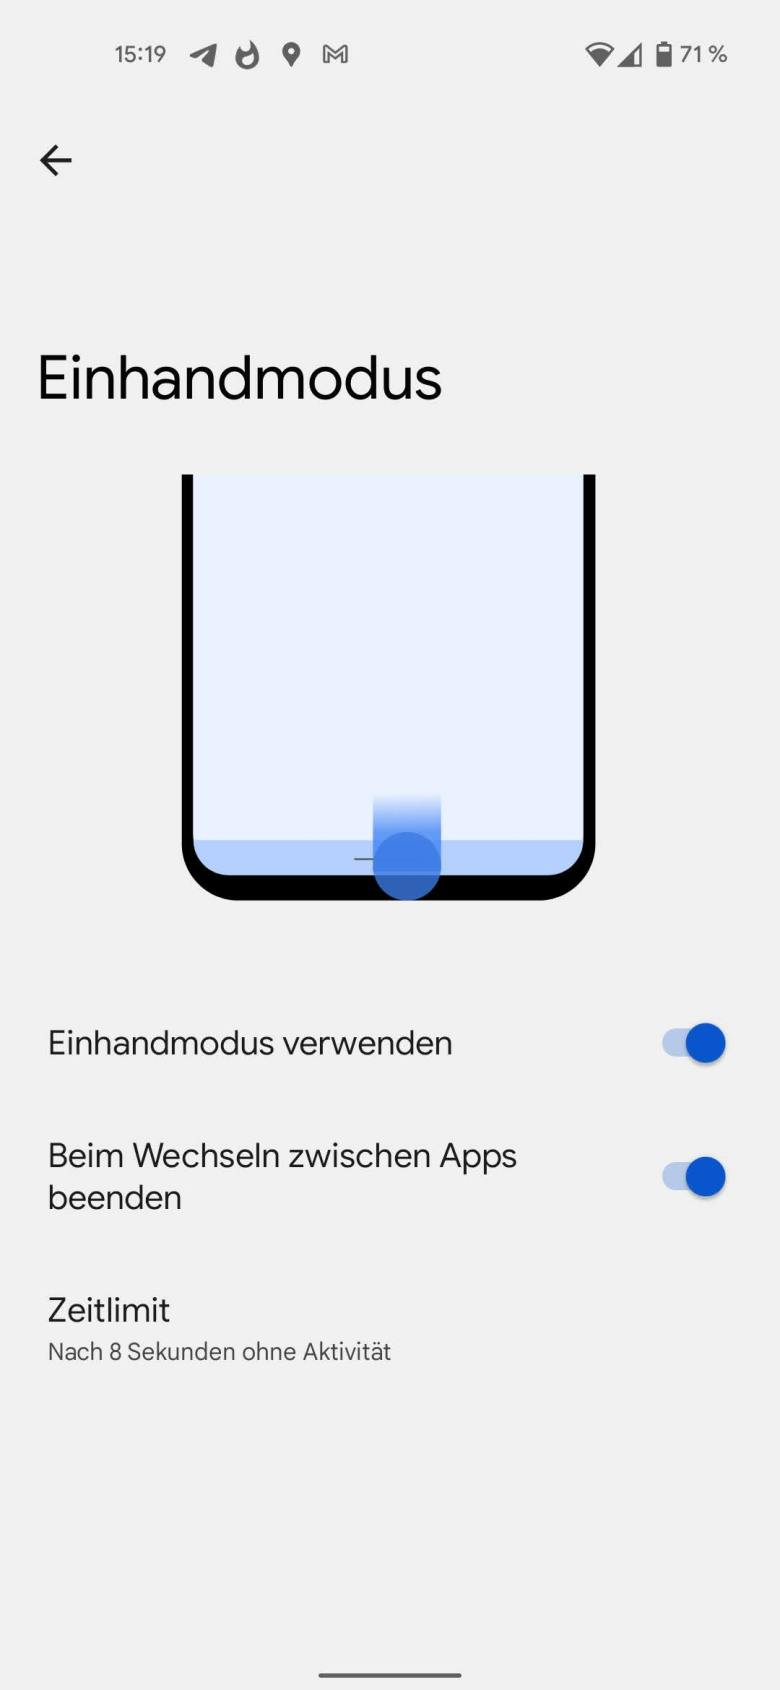 Android 12 Beta Einhandmodus